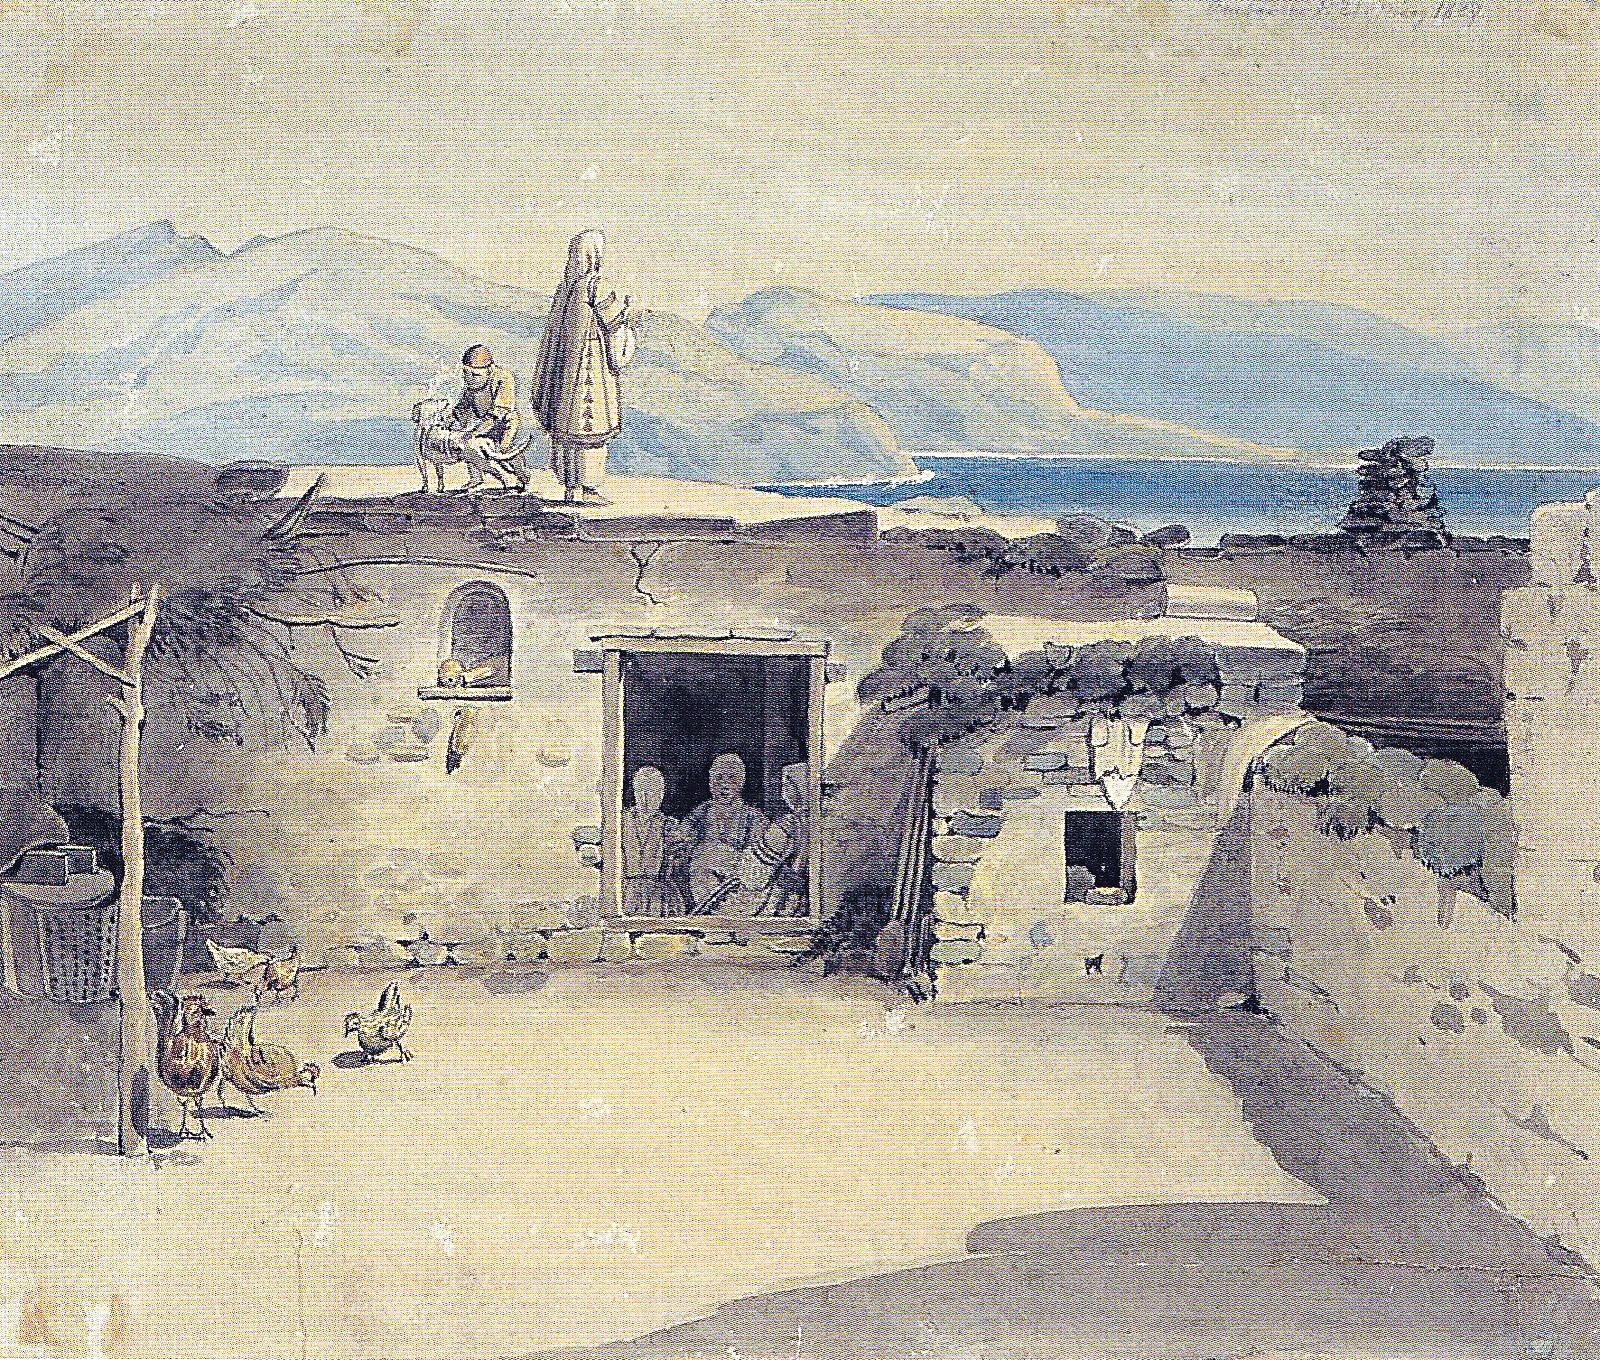 De flesta greker bodde i enkla hus på landsbygden.